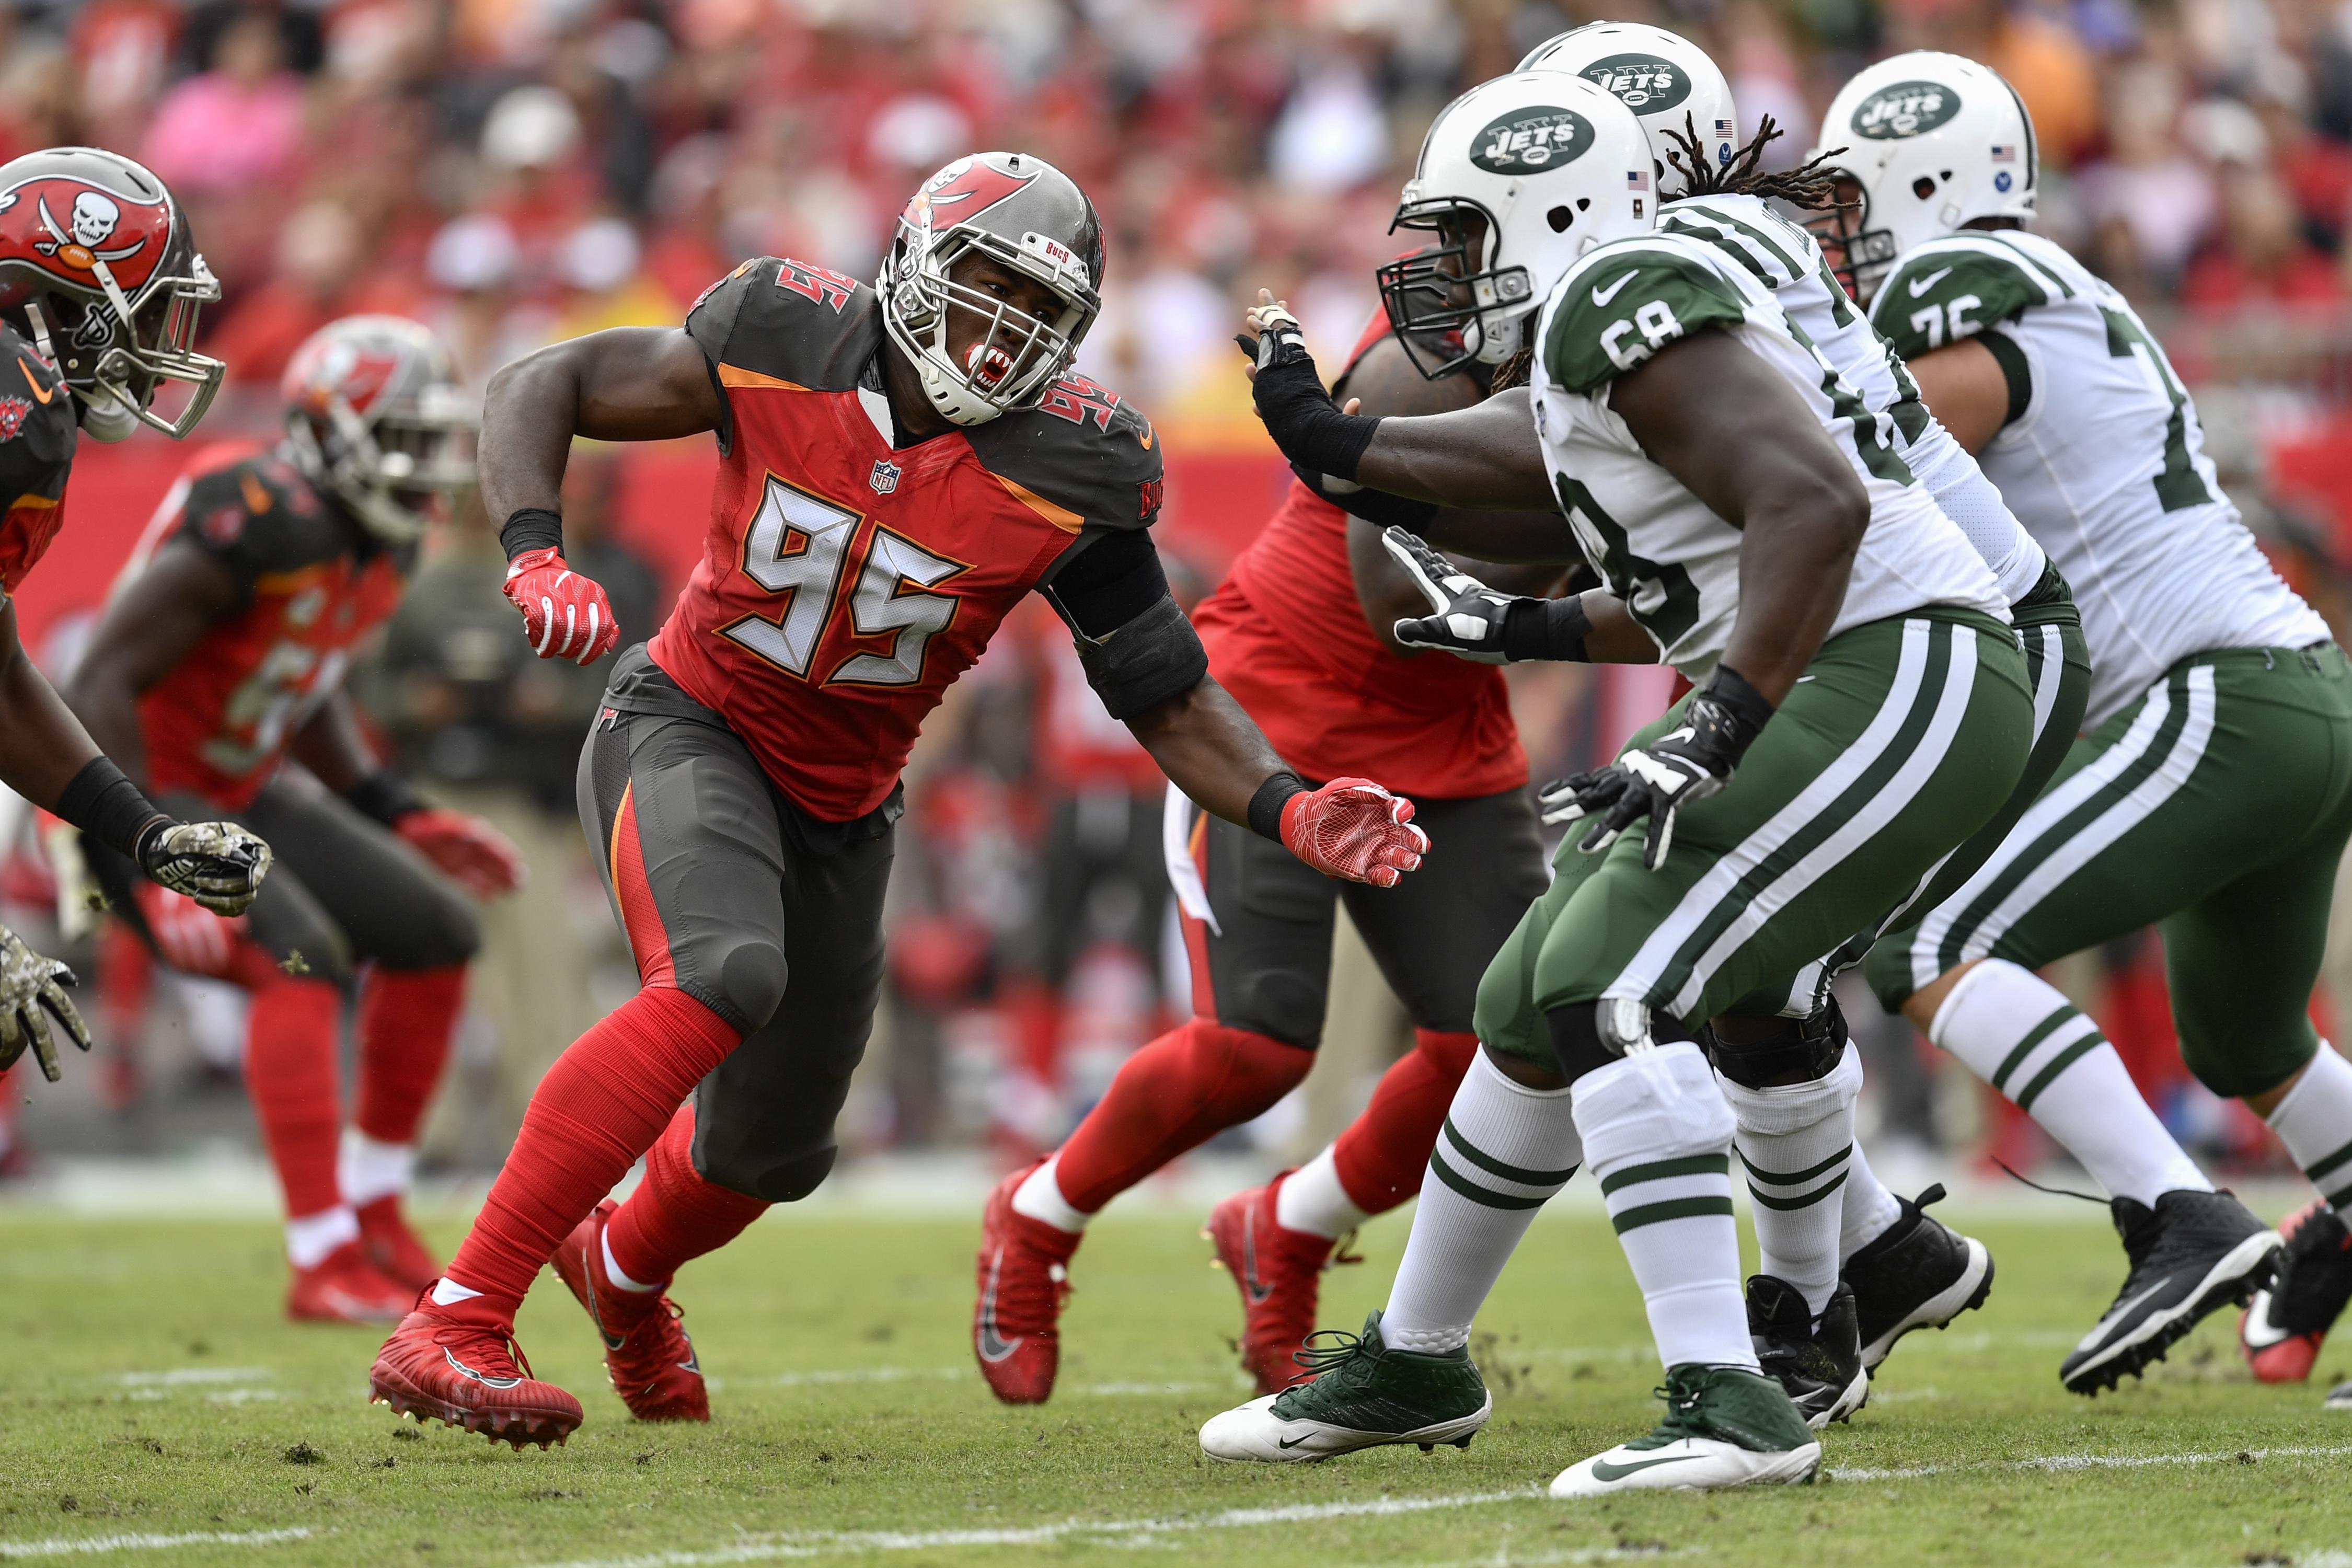 NFL: NOV 12 Jets at Buccaneers